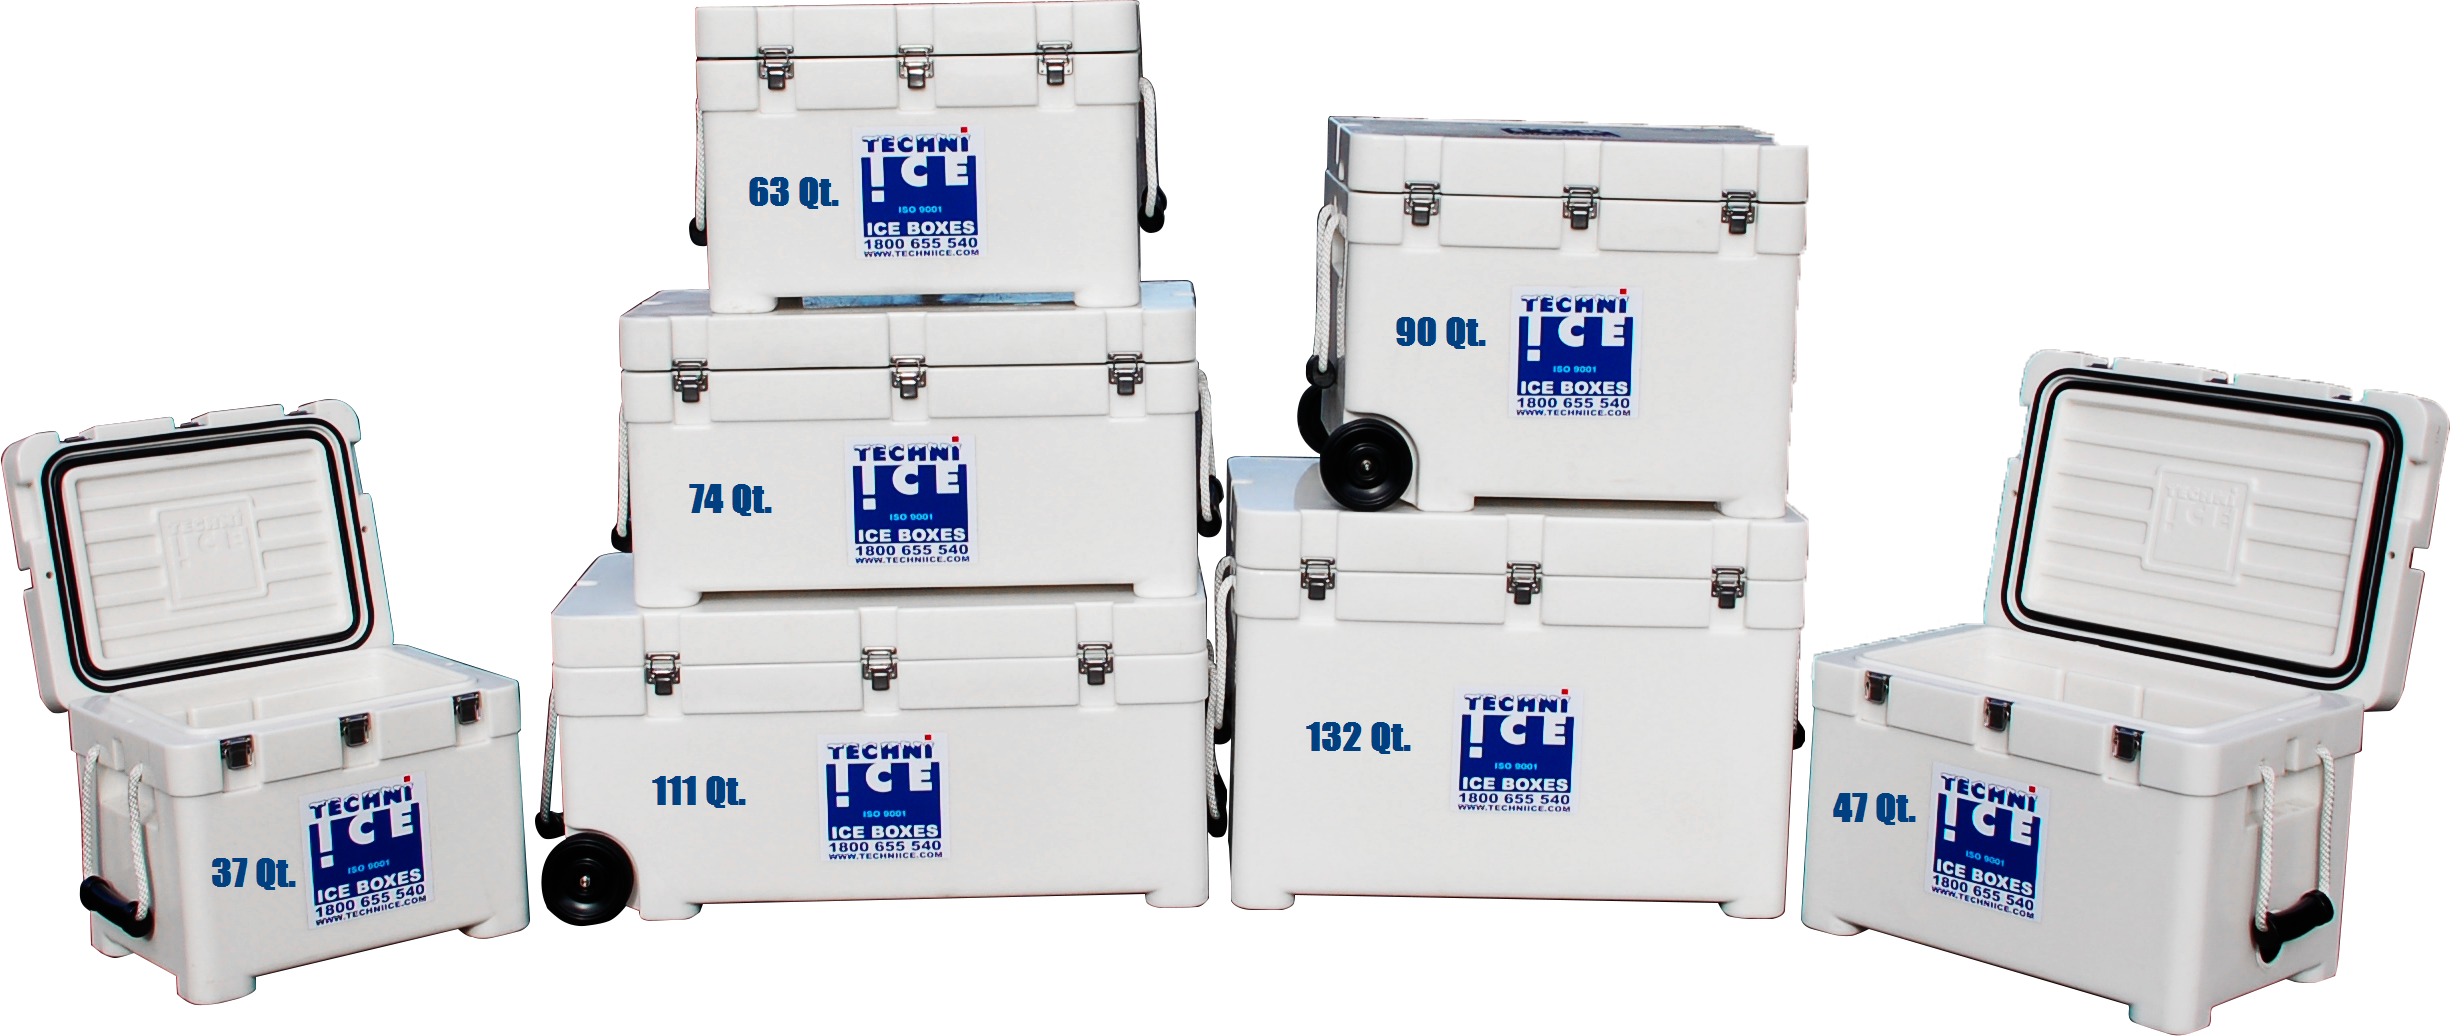 techniice premium cooler ice chest series